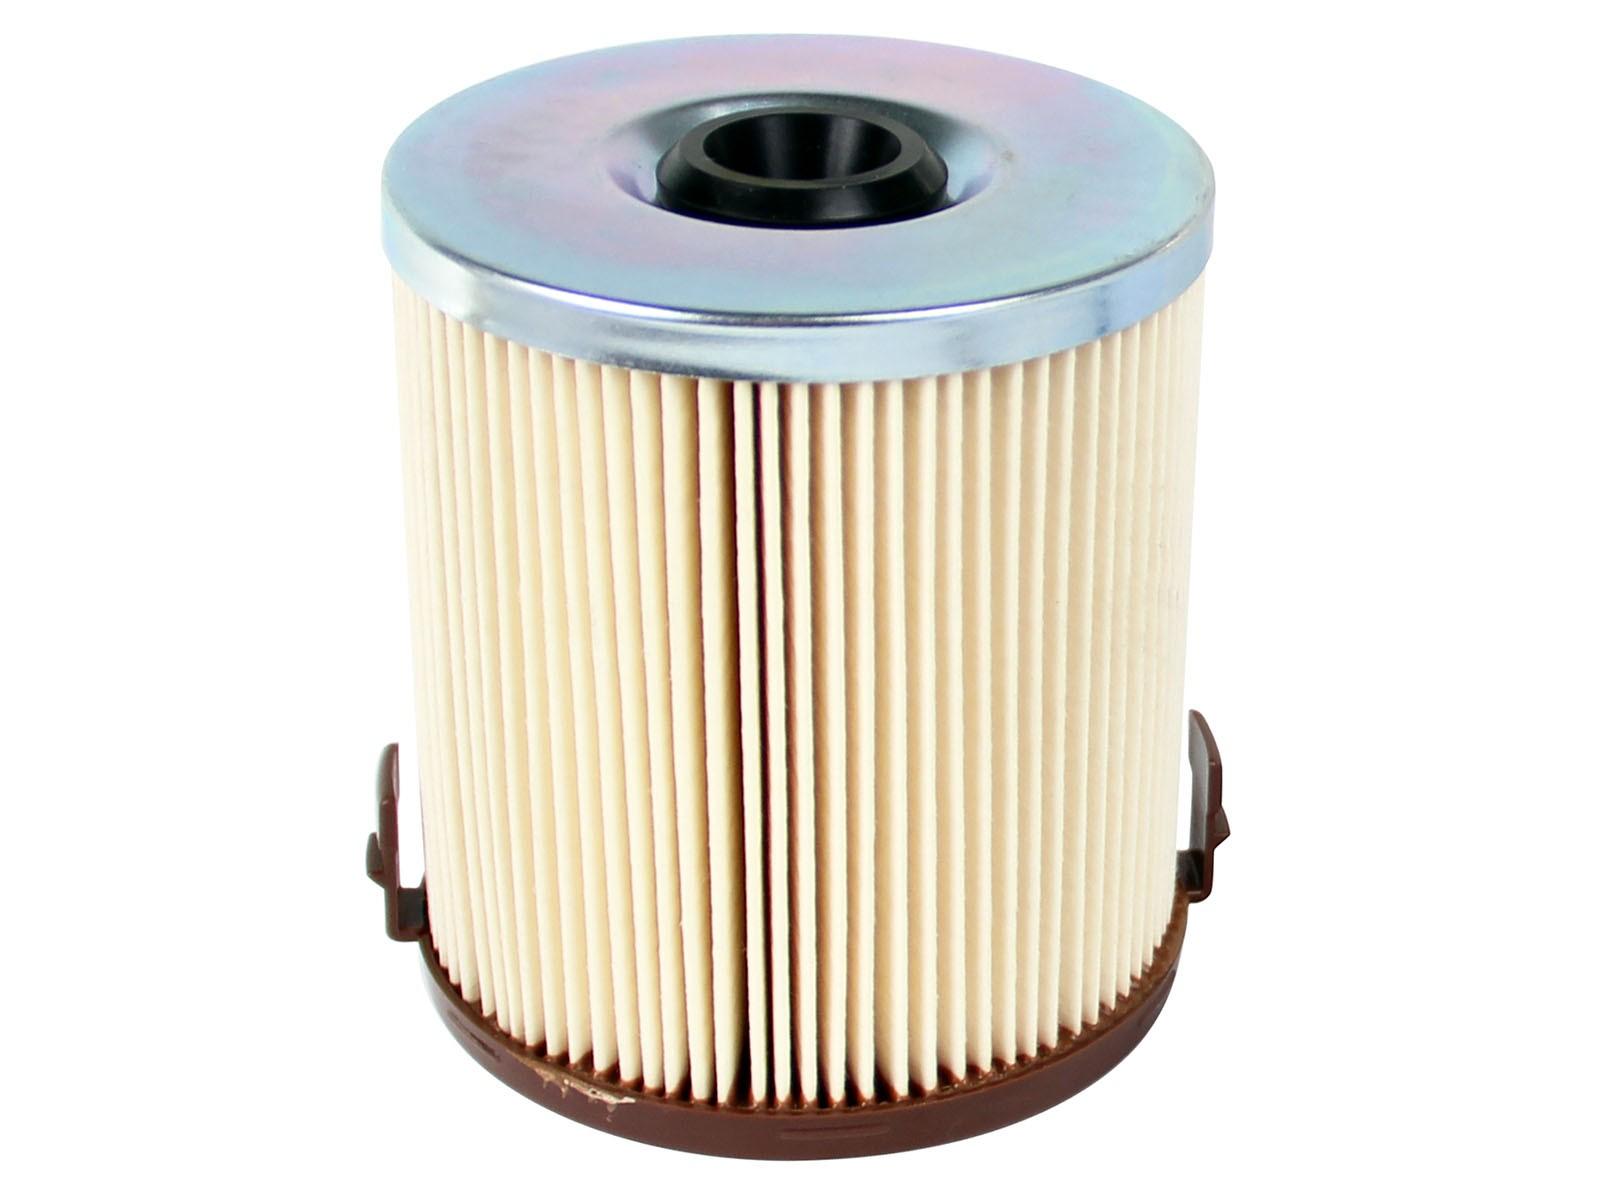 aFe POWER 44-FF009 Pro GUARD D2 Fuel Filter